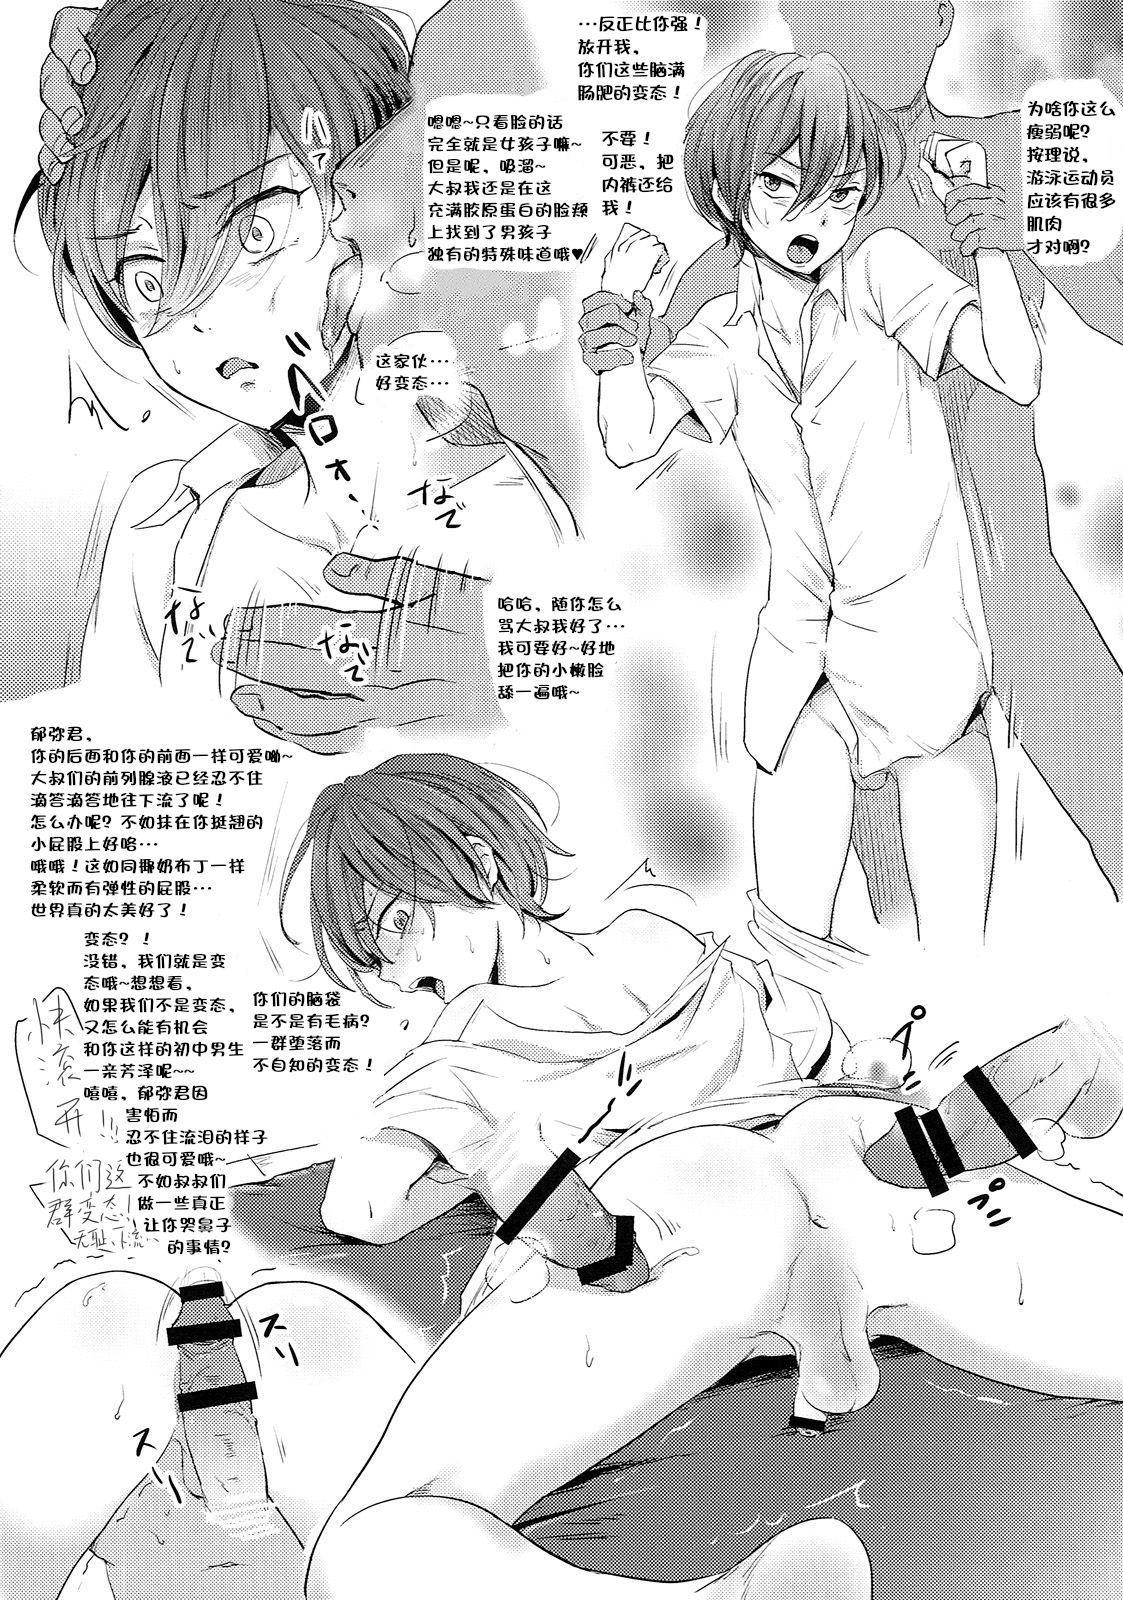 Semen☆Splash!! 14